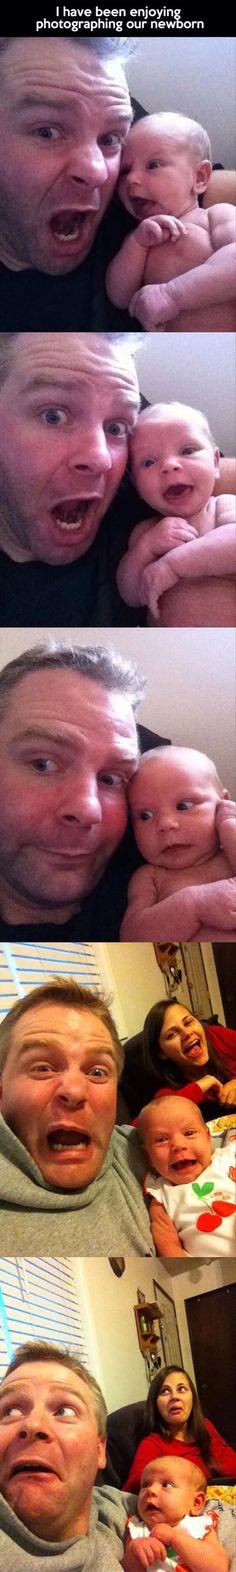 Funny kid photos | New borns are fun!